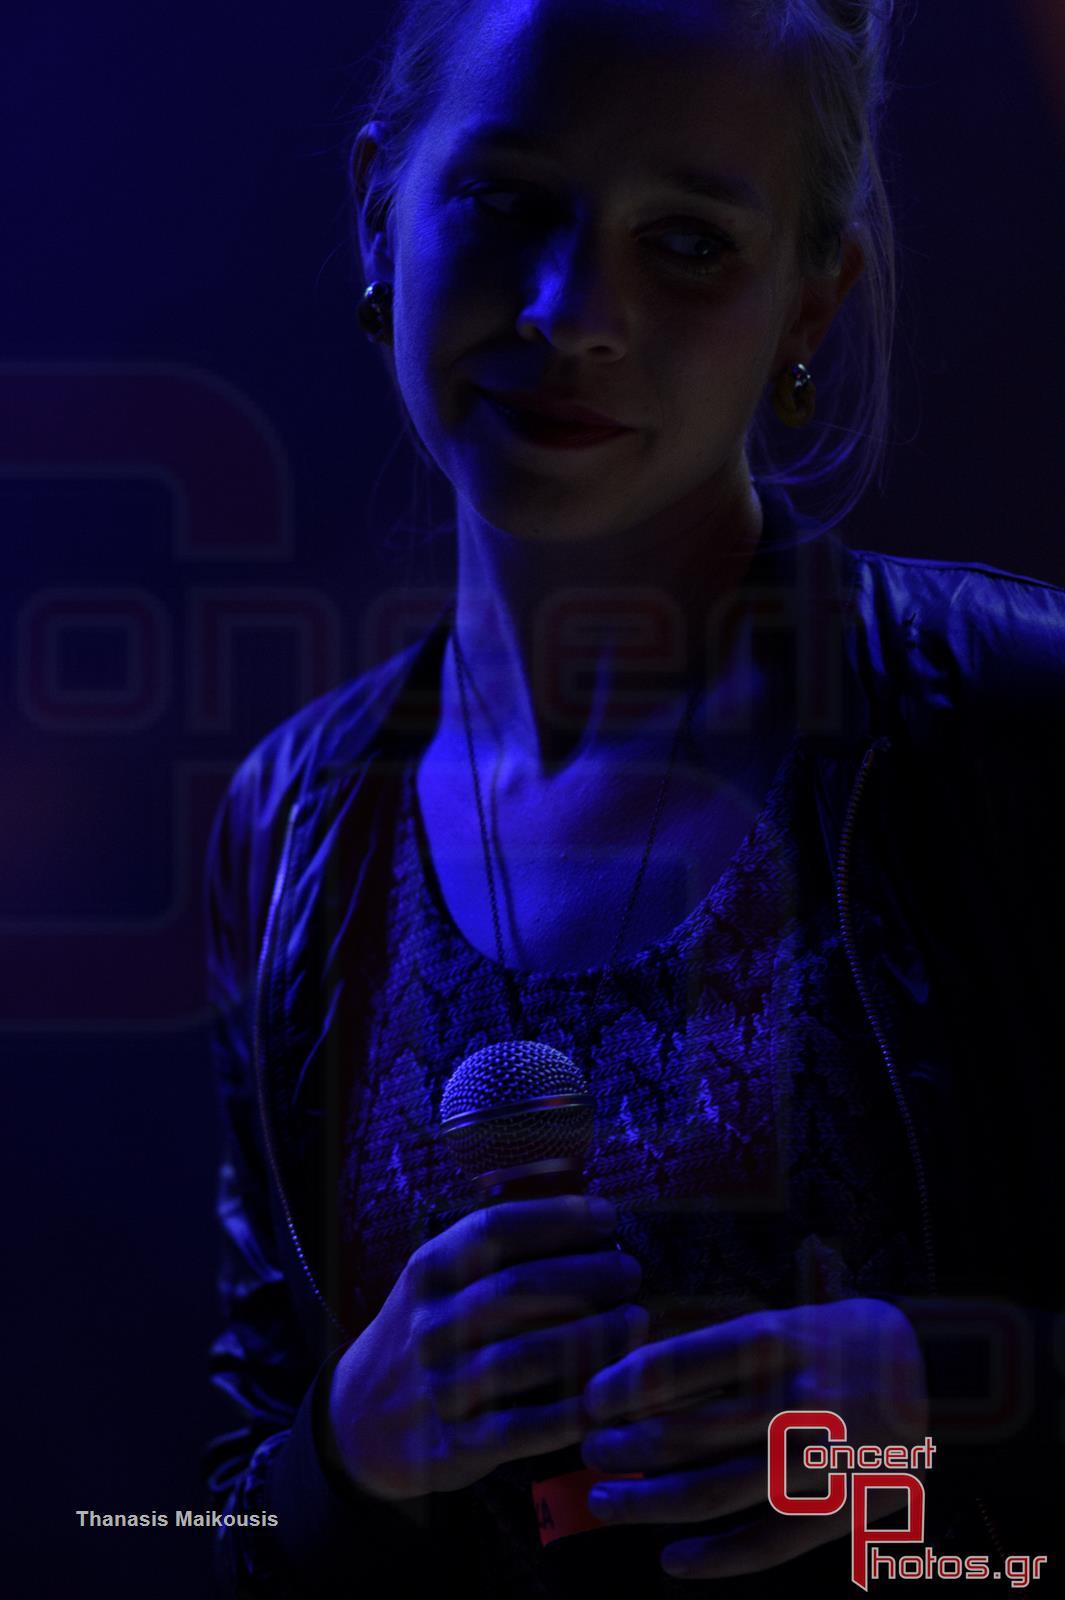 Active Member - Τραγούδα μας να φύγει το σκοτάδι- photographer: Thanasis Maikousis - concertphotos_-5750